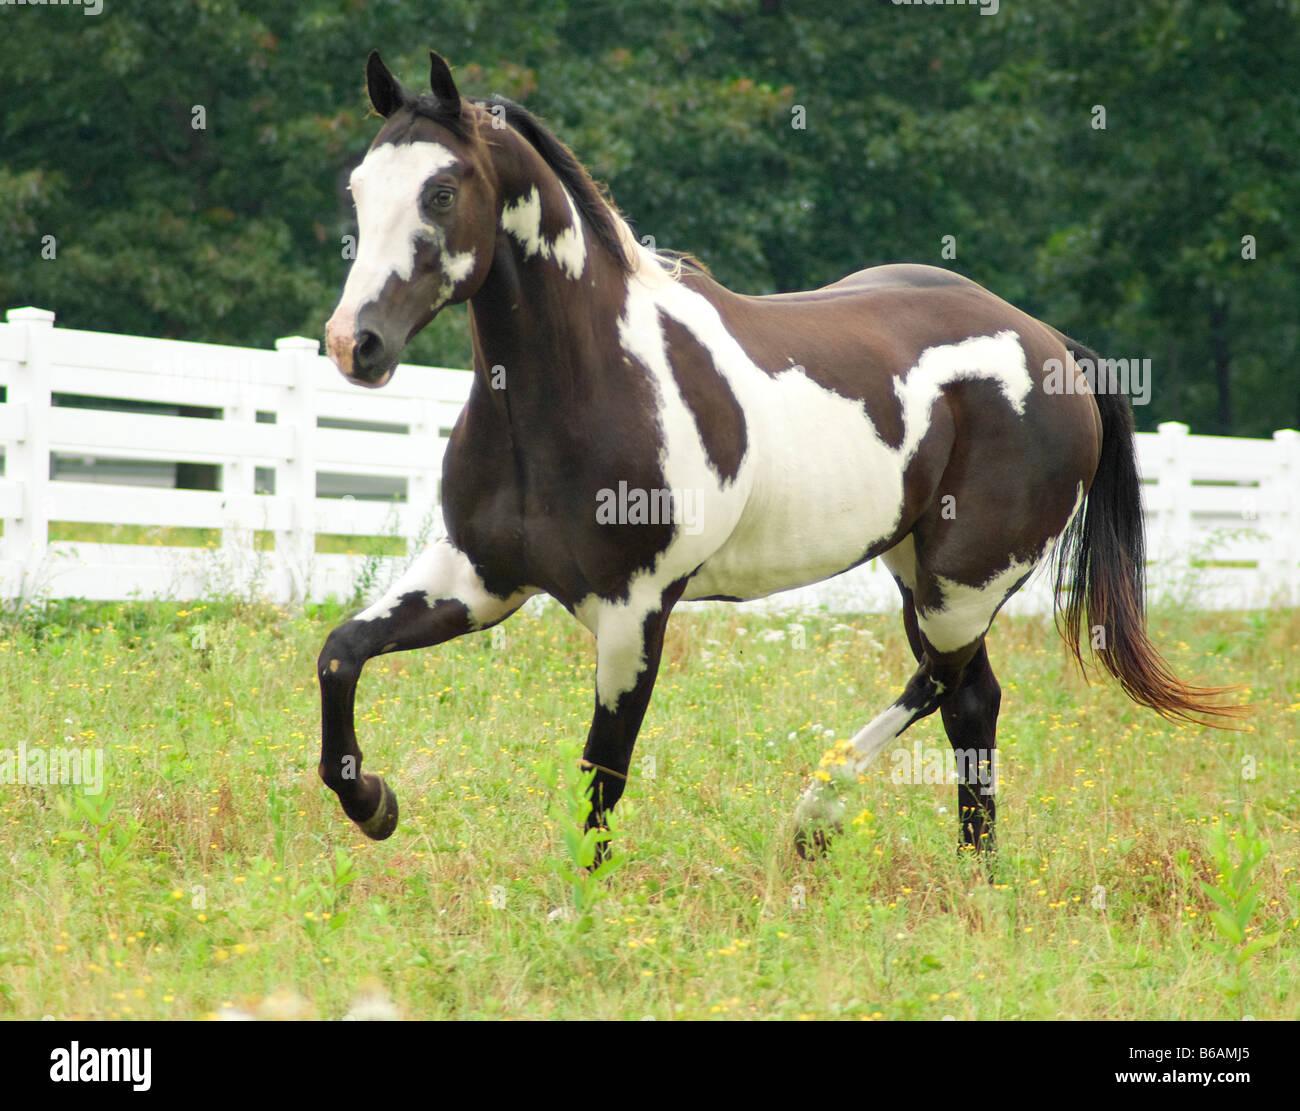 American Paint Quarterhorse gelding - Stock Image